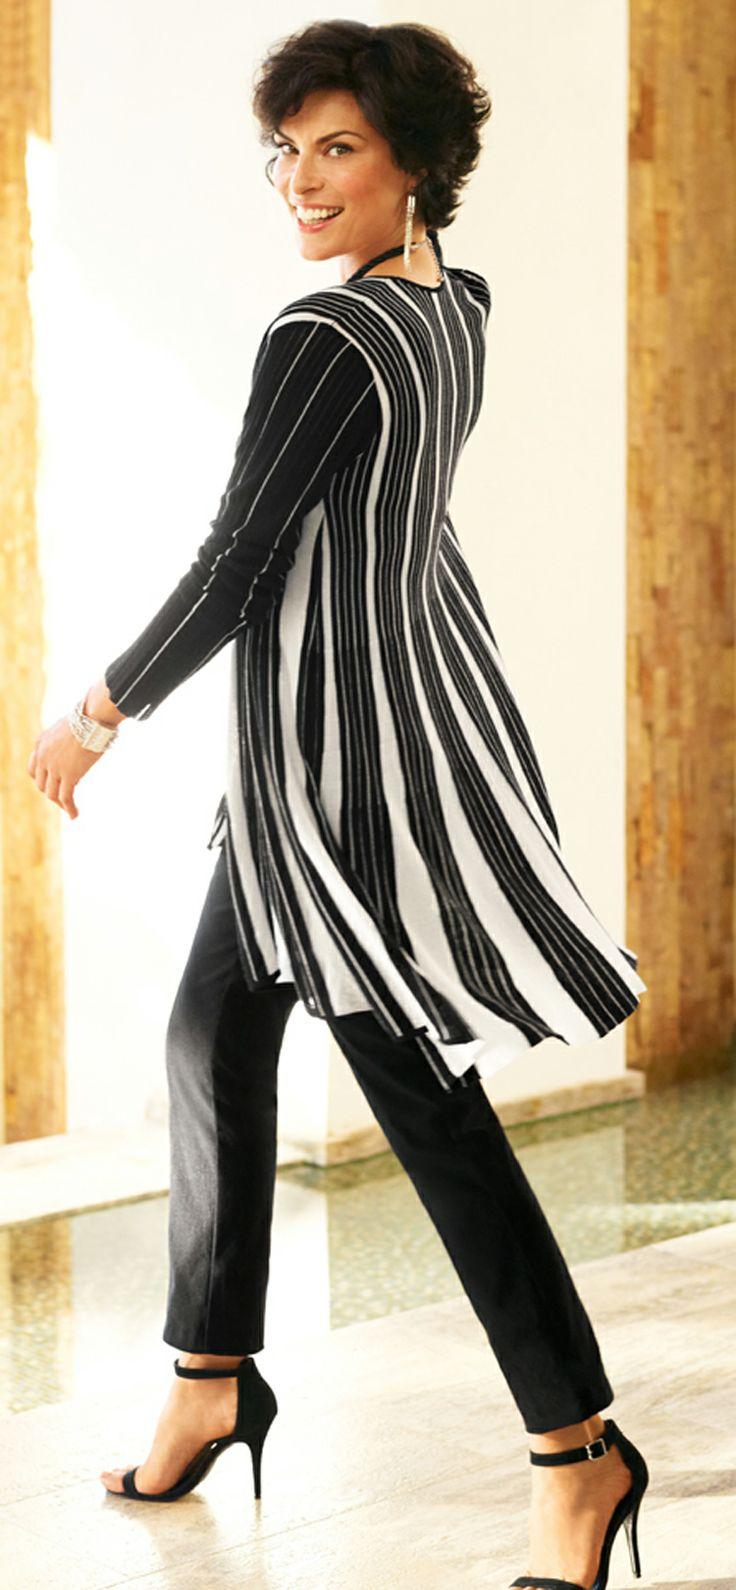 Drama Stripe Ann Cardigan #DestinationFabulous #travel #SoSlimming #spring #chicos